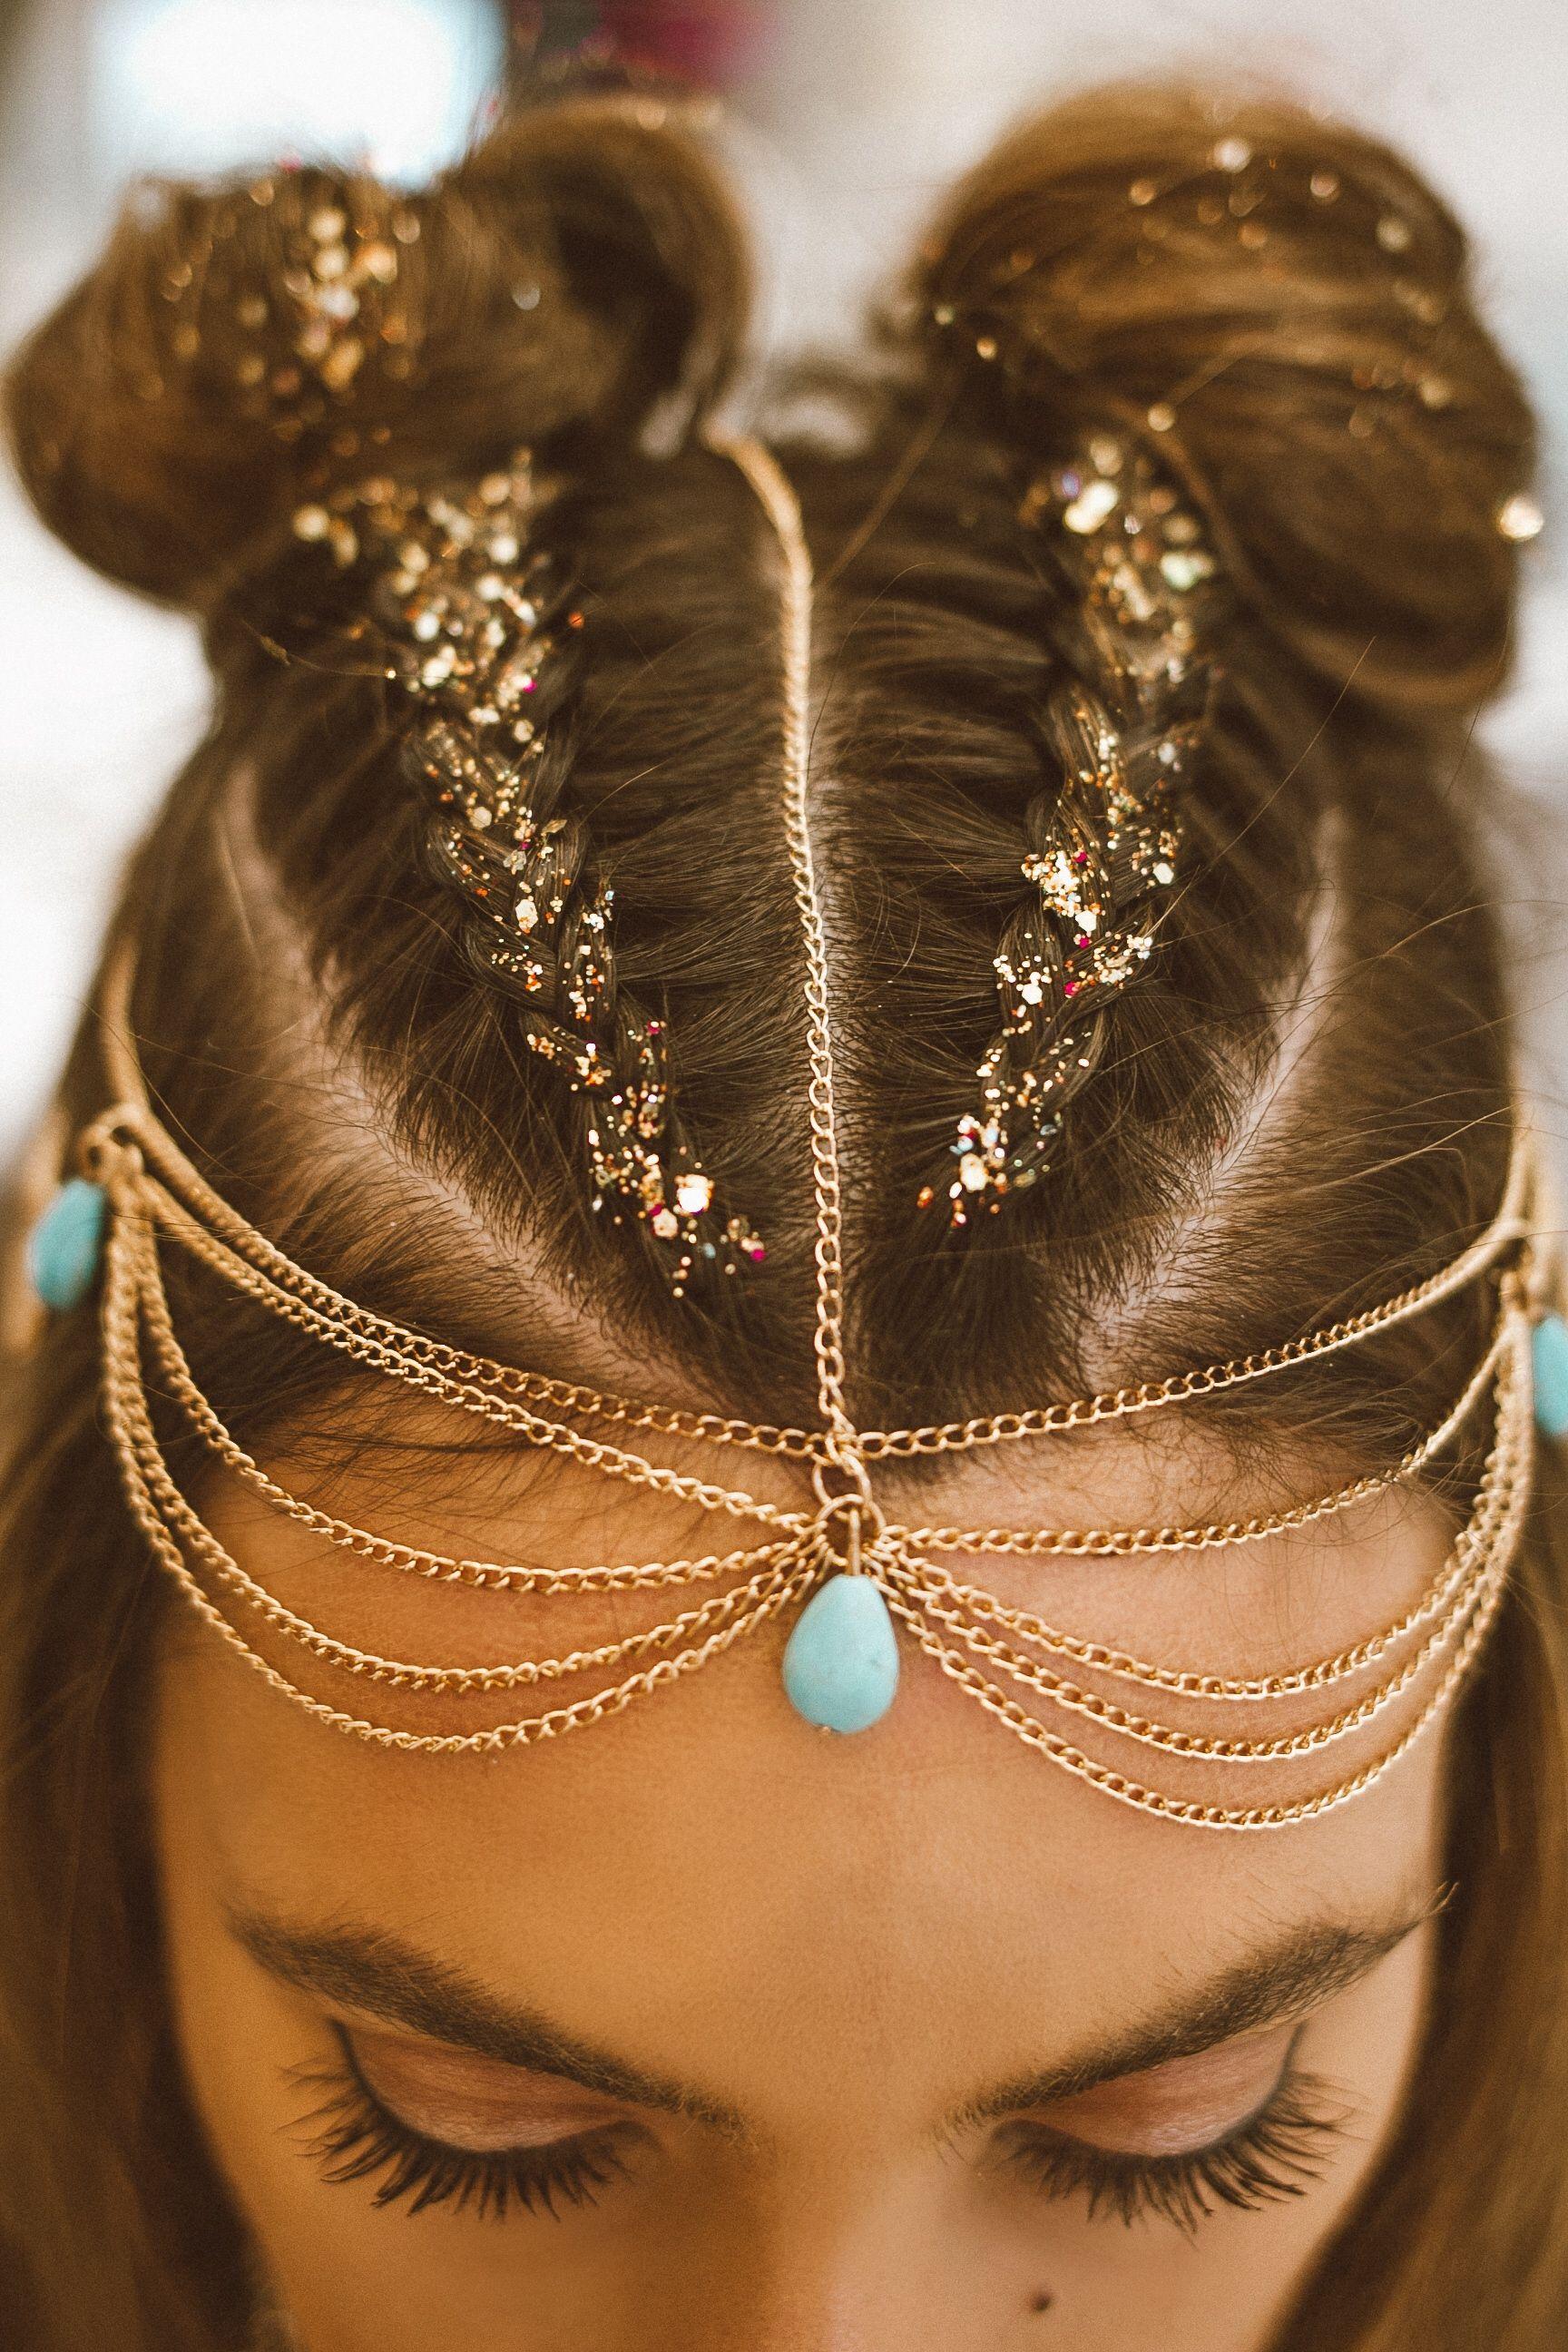 20 Accesorios para el cabello y Niñas Joyería 40p bolsas de cada parte Lucky Dip recaudación de fondos